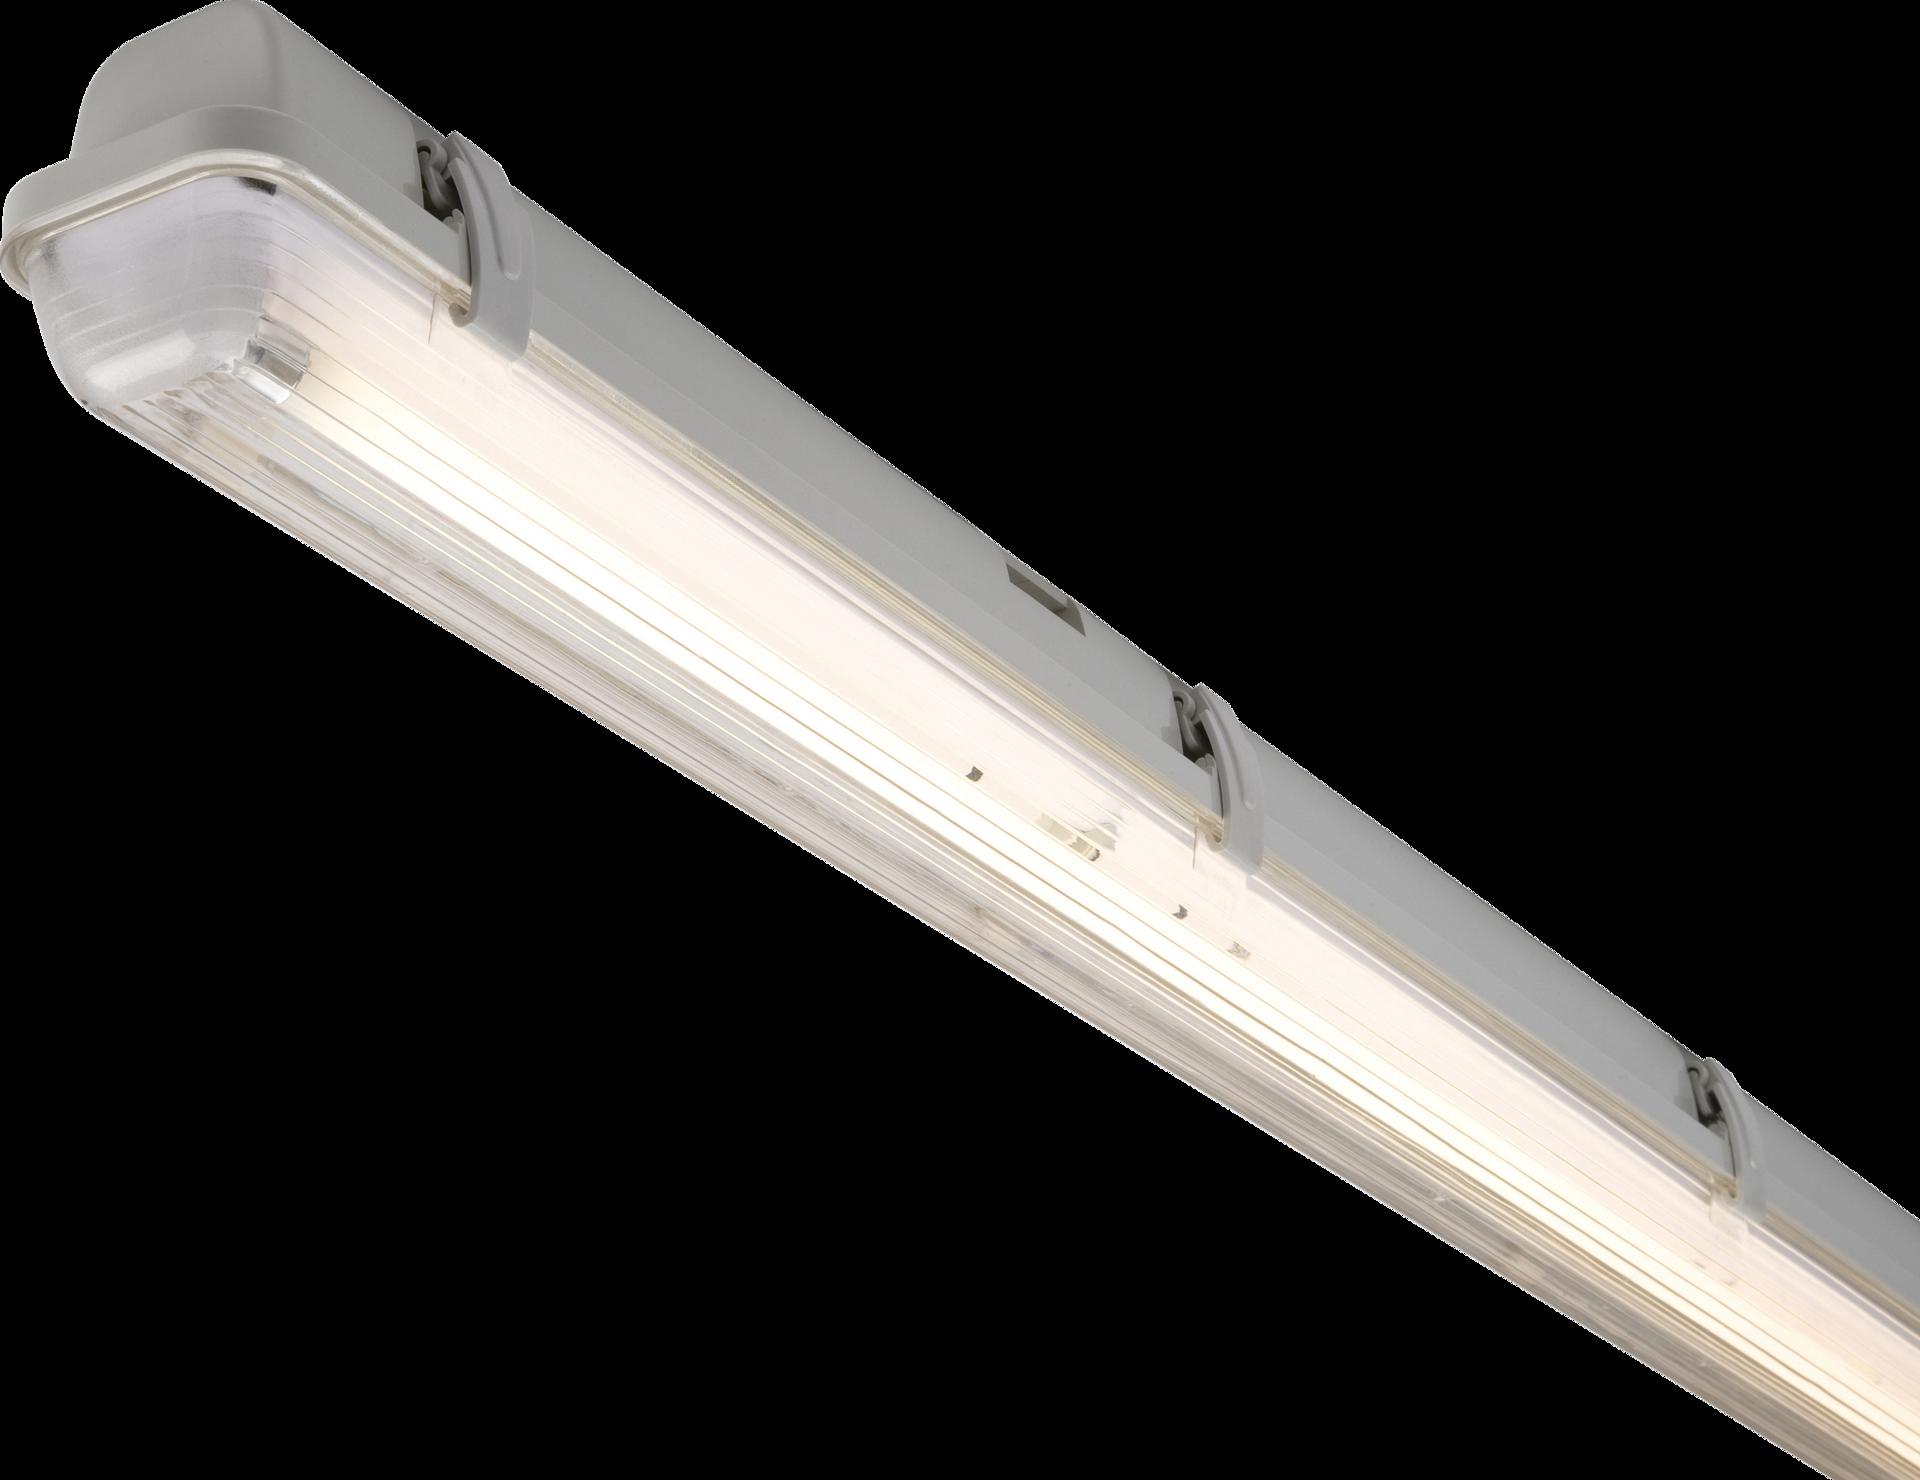 230V IP65 1X14W T5 HF Single Non-Corrosive Fluorescent Fitting 2ft